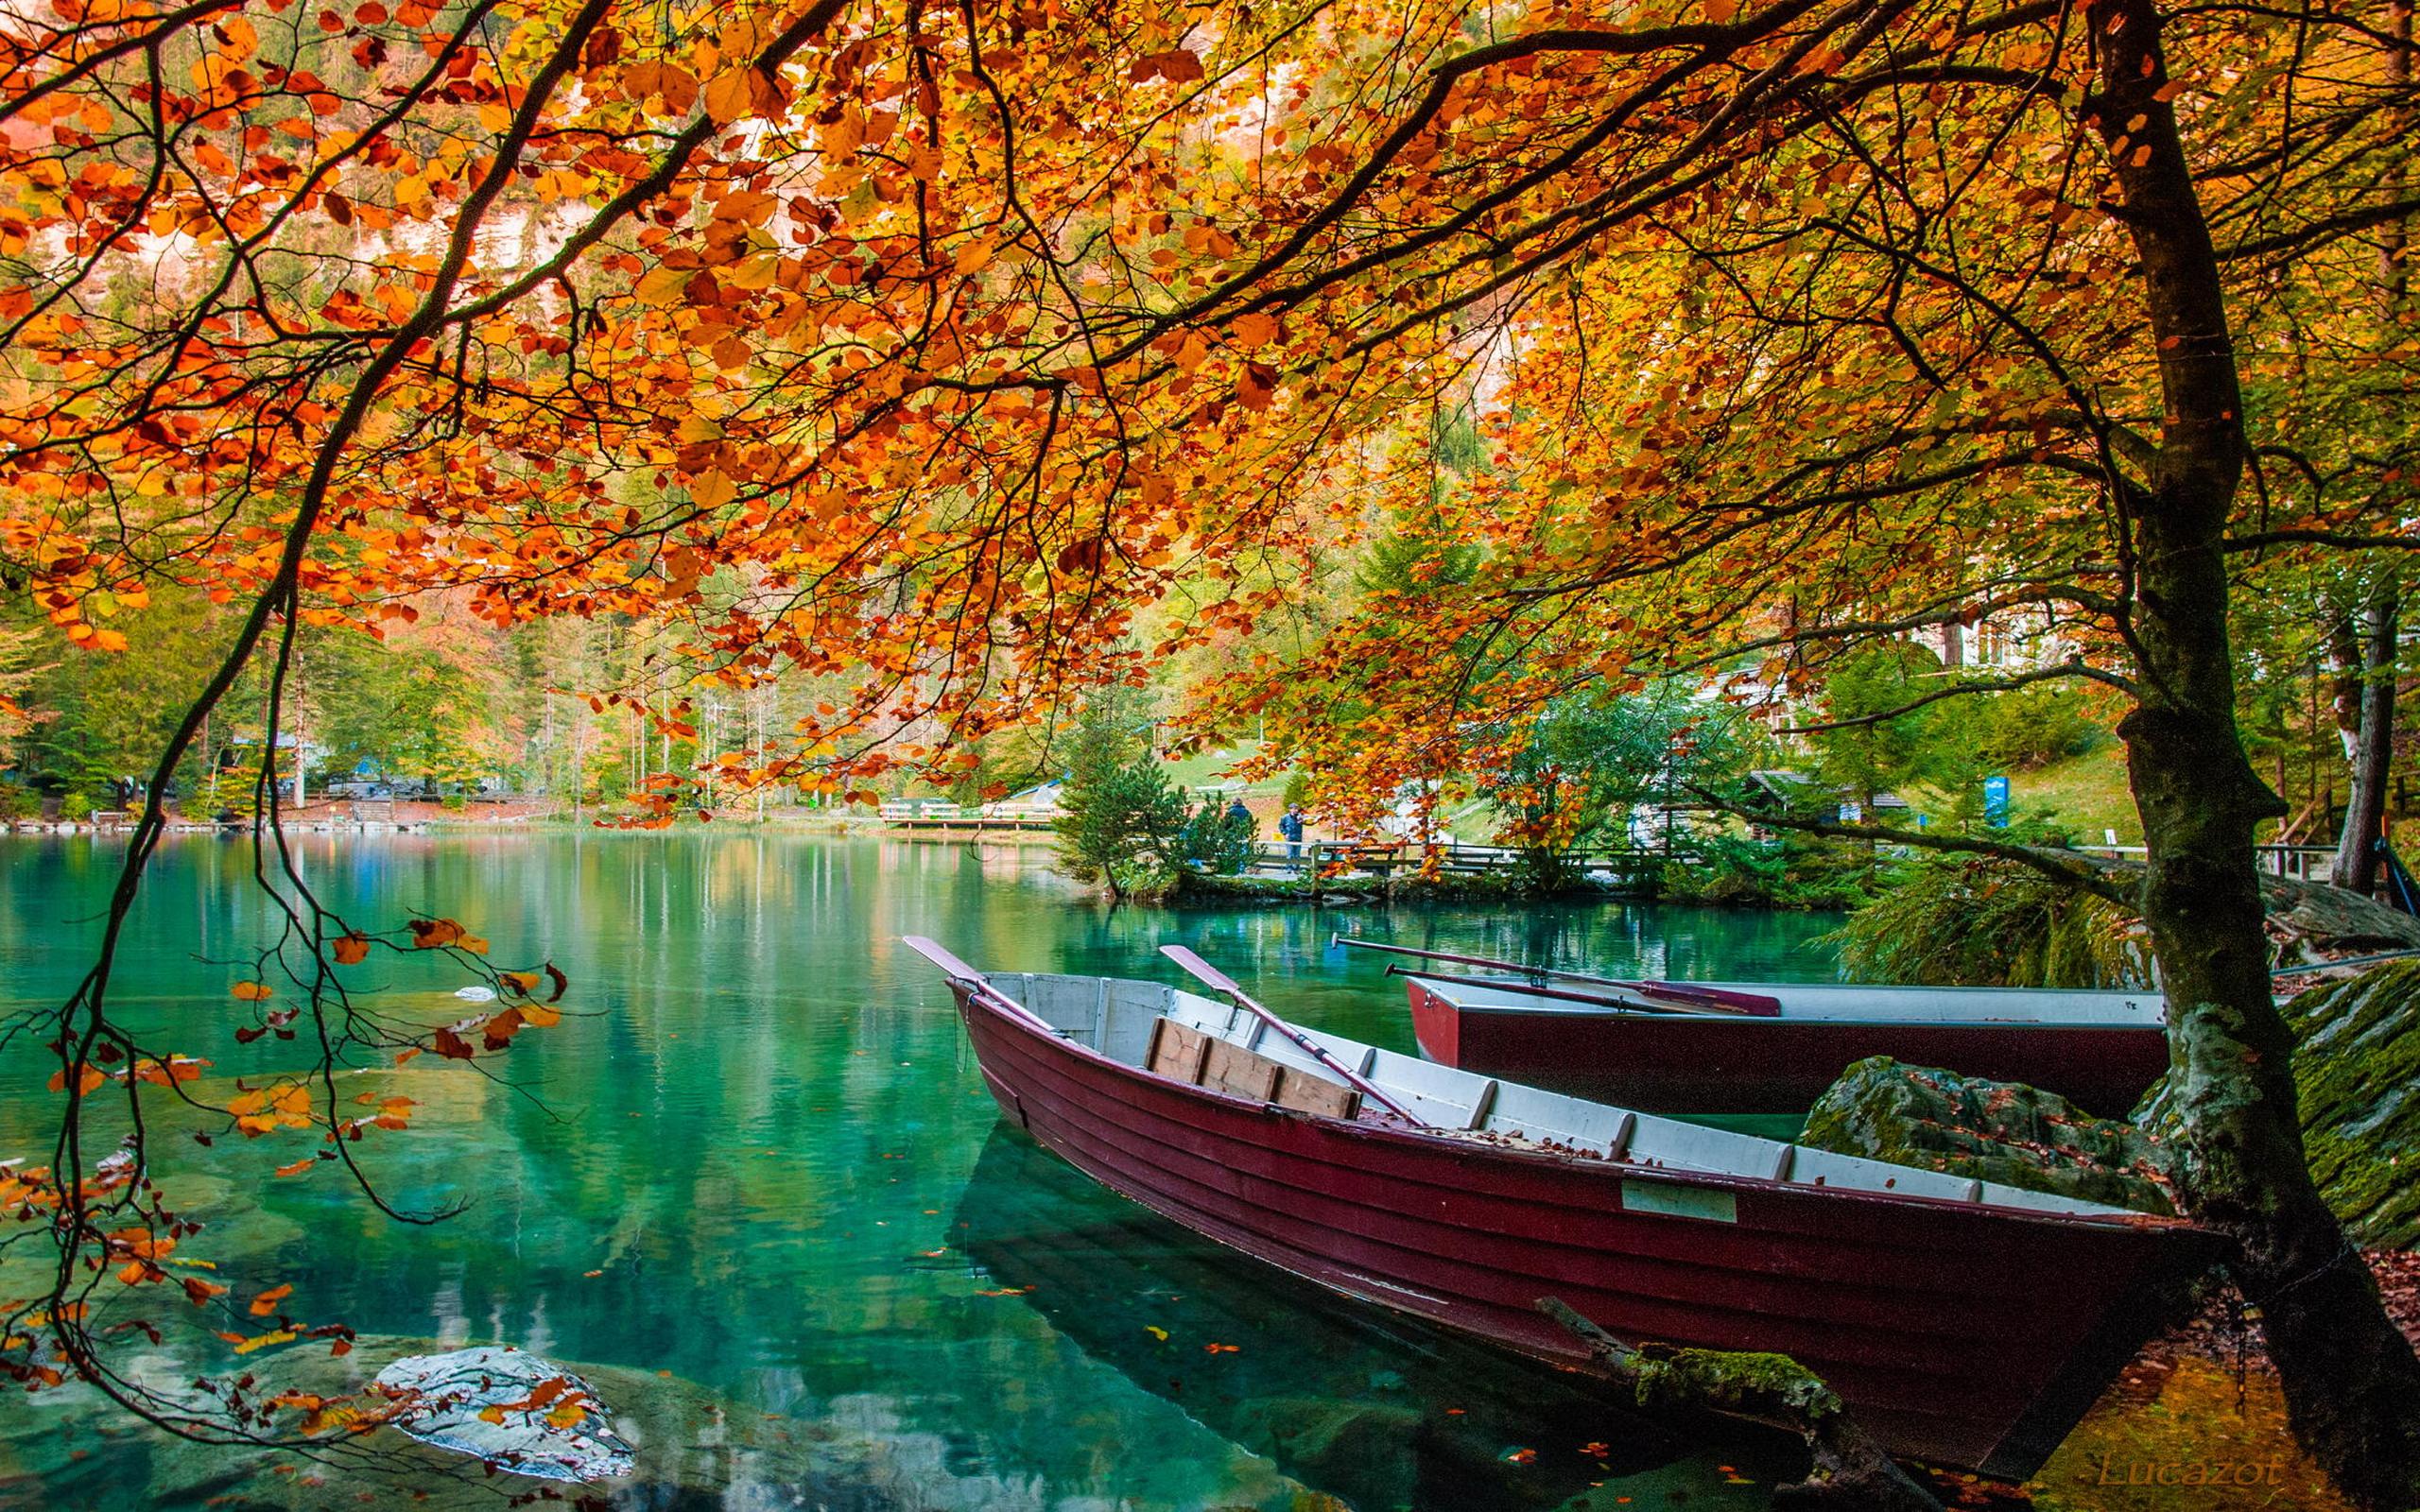 Autumn Lake Beautiful Turquoise Water Trees Hd Wallpaper 73142 ...